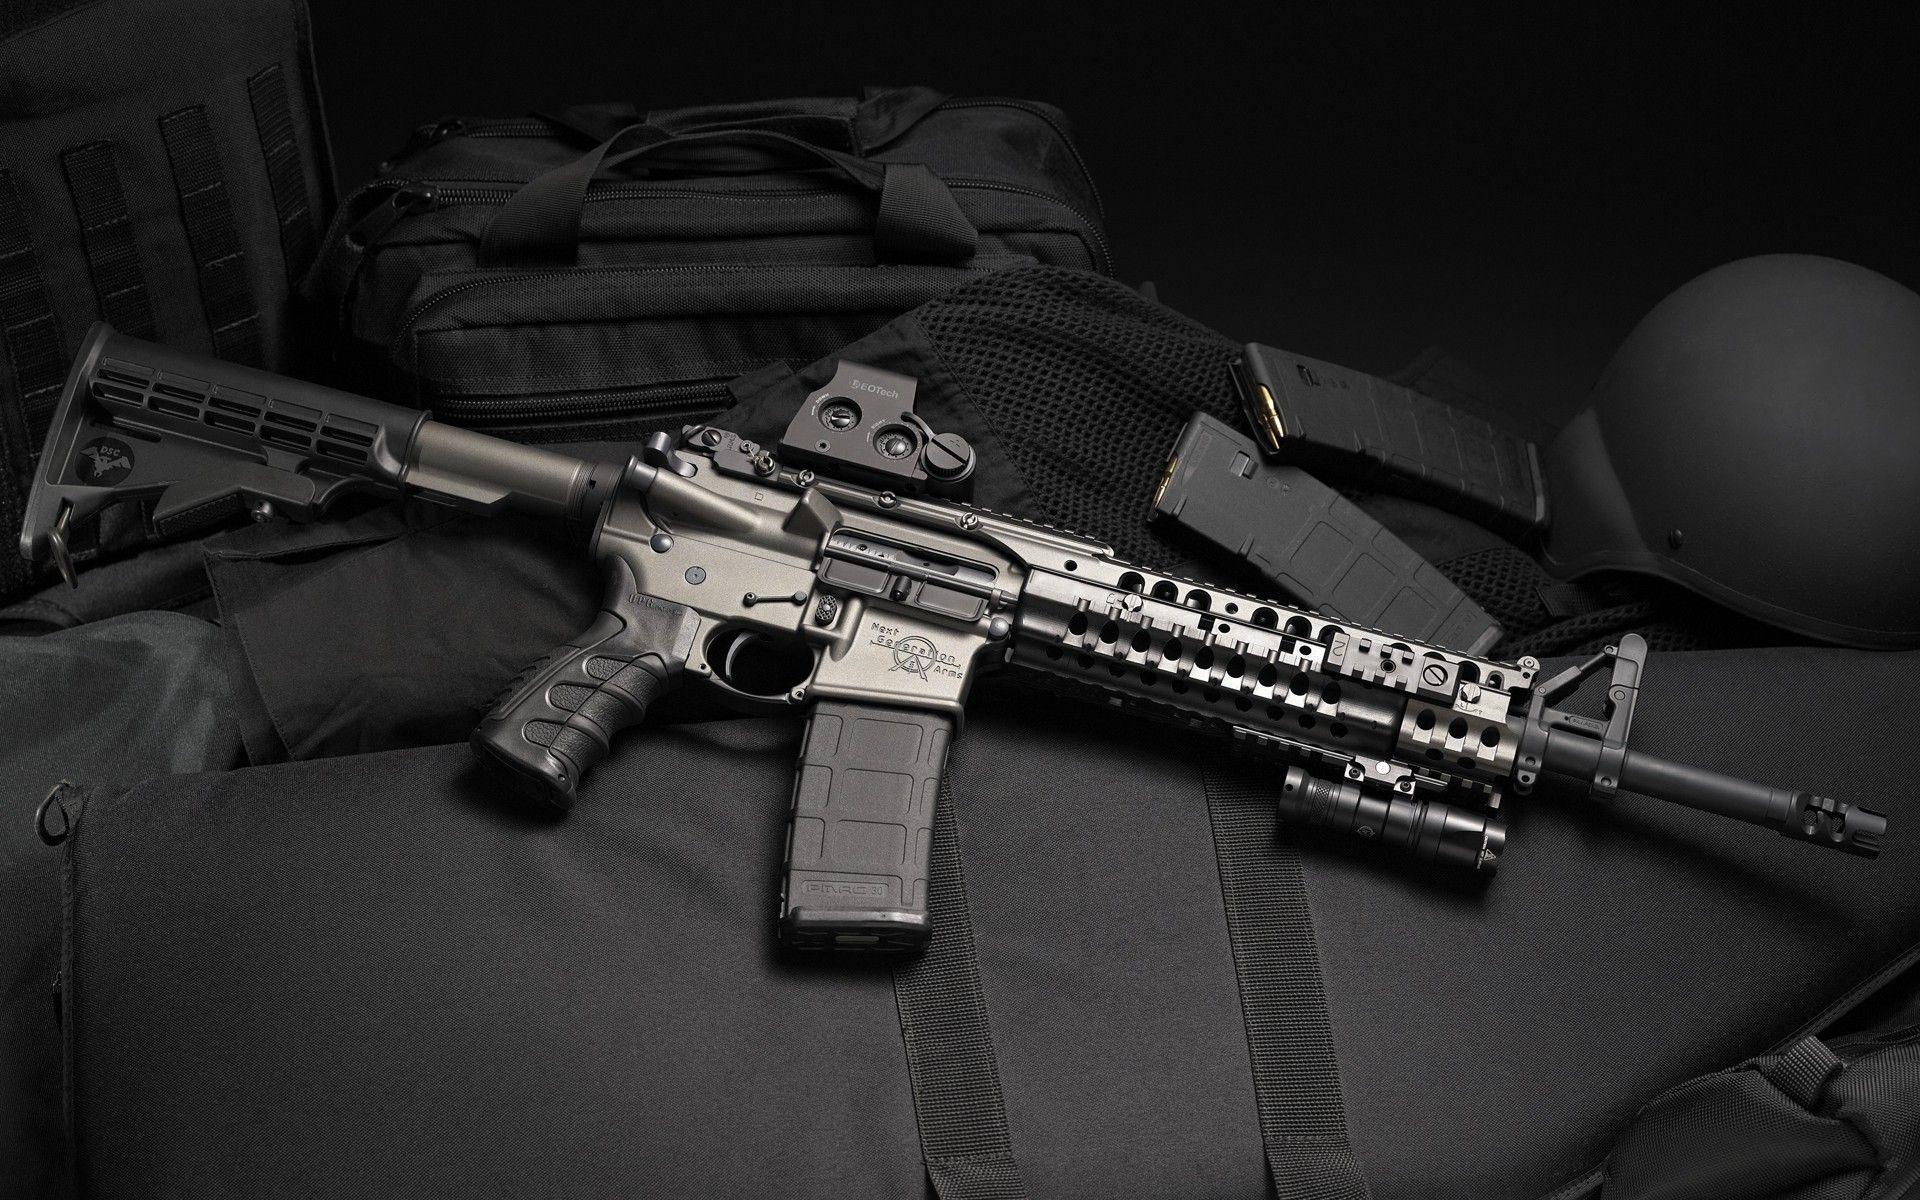 Pubg Wallpaper Flare Gun: PUBG Guns Wallpapers